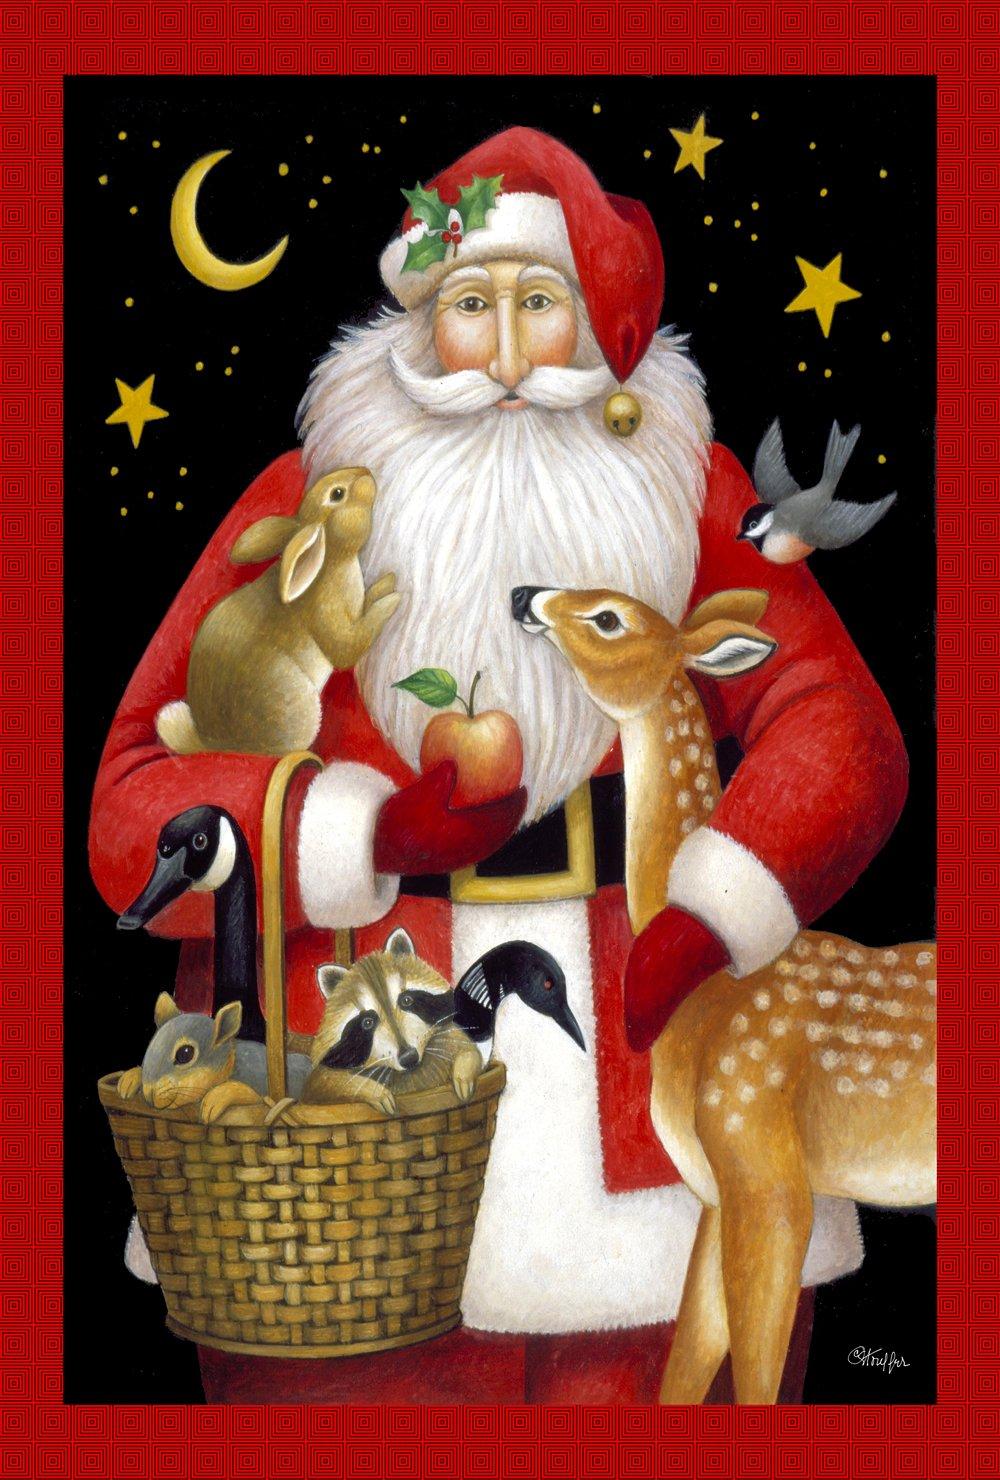 Toland Home Garden Santa's Friends 12.5 x 18 Inch Decorative Colorful Winter Holiday Christmas Animal Deer Bird Garden Flag - 119695, Red/White/Black